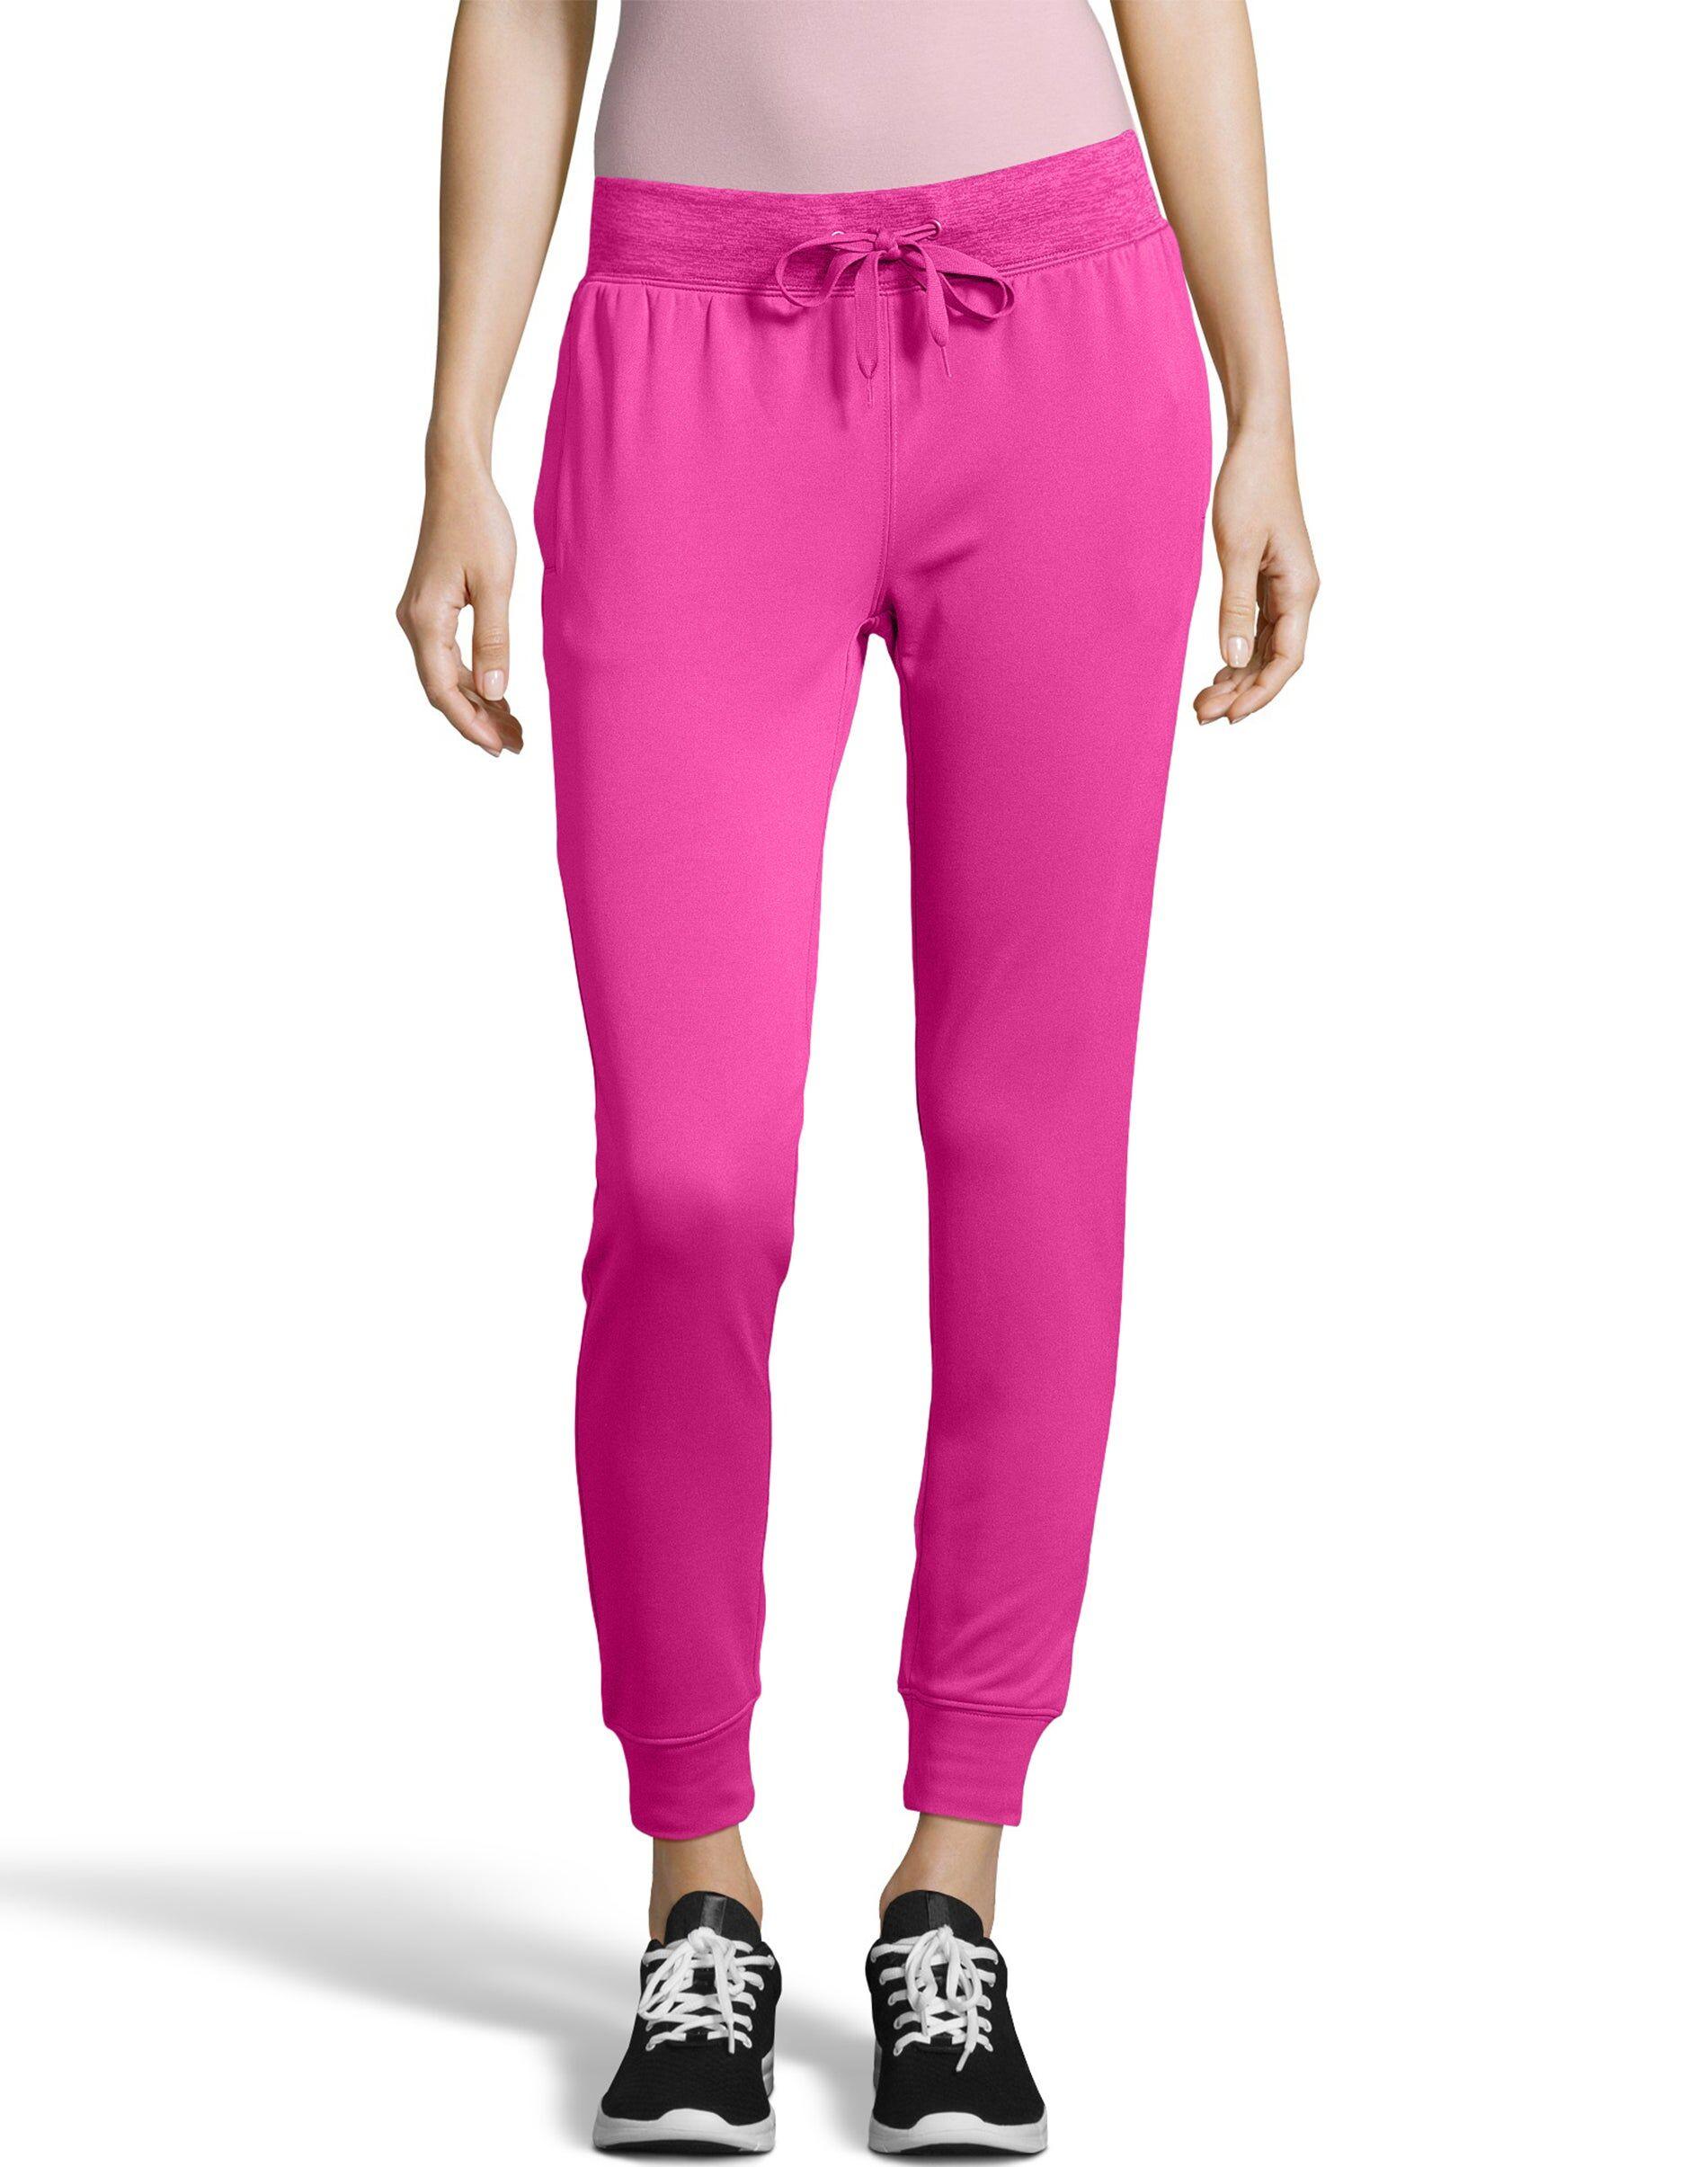 Hanes Sport Women's Performance Fleece Jogger Pants With Pockets Fresh Berry/Fresh Berry Heather M